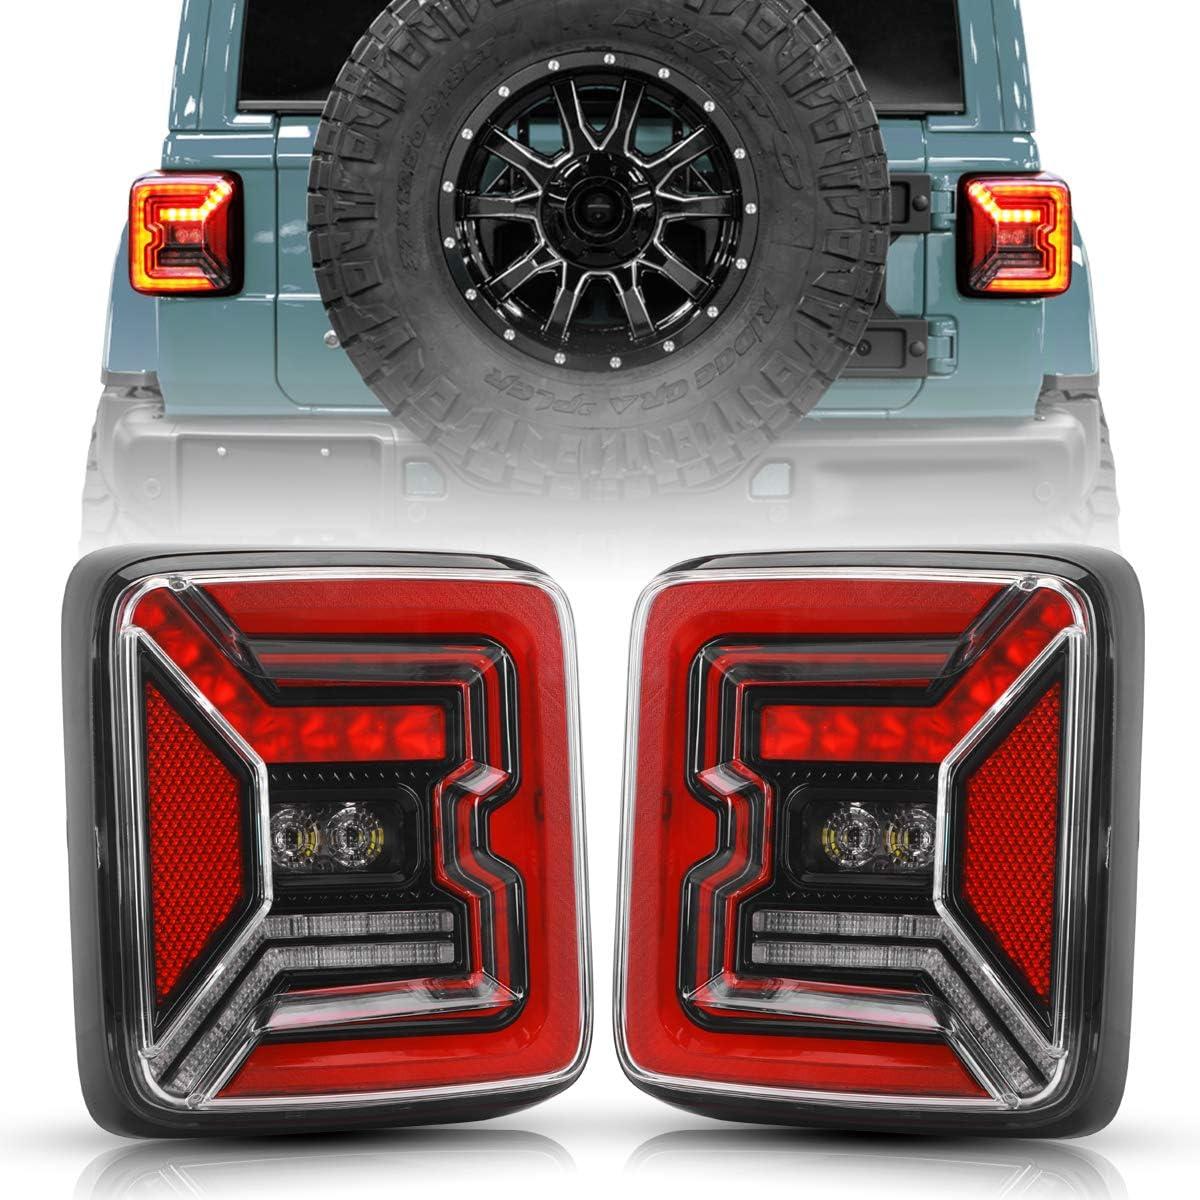 COWONE 30W Reverse Lights LED Light Tail Brake Now free shipping cheap Compatib